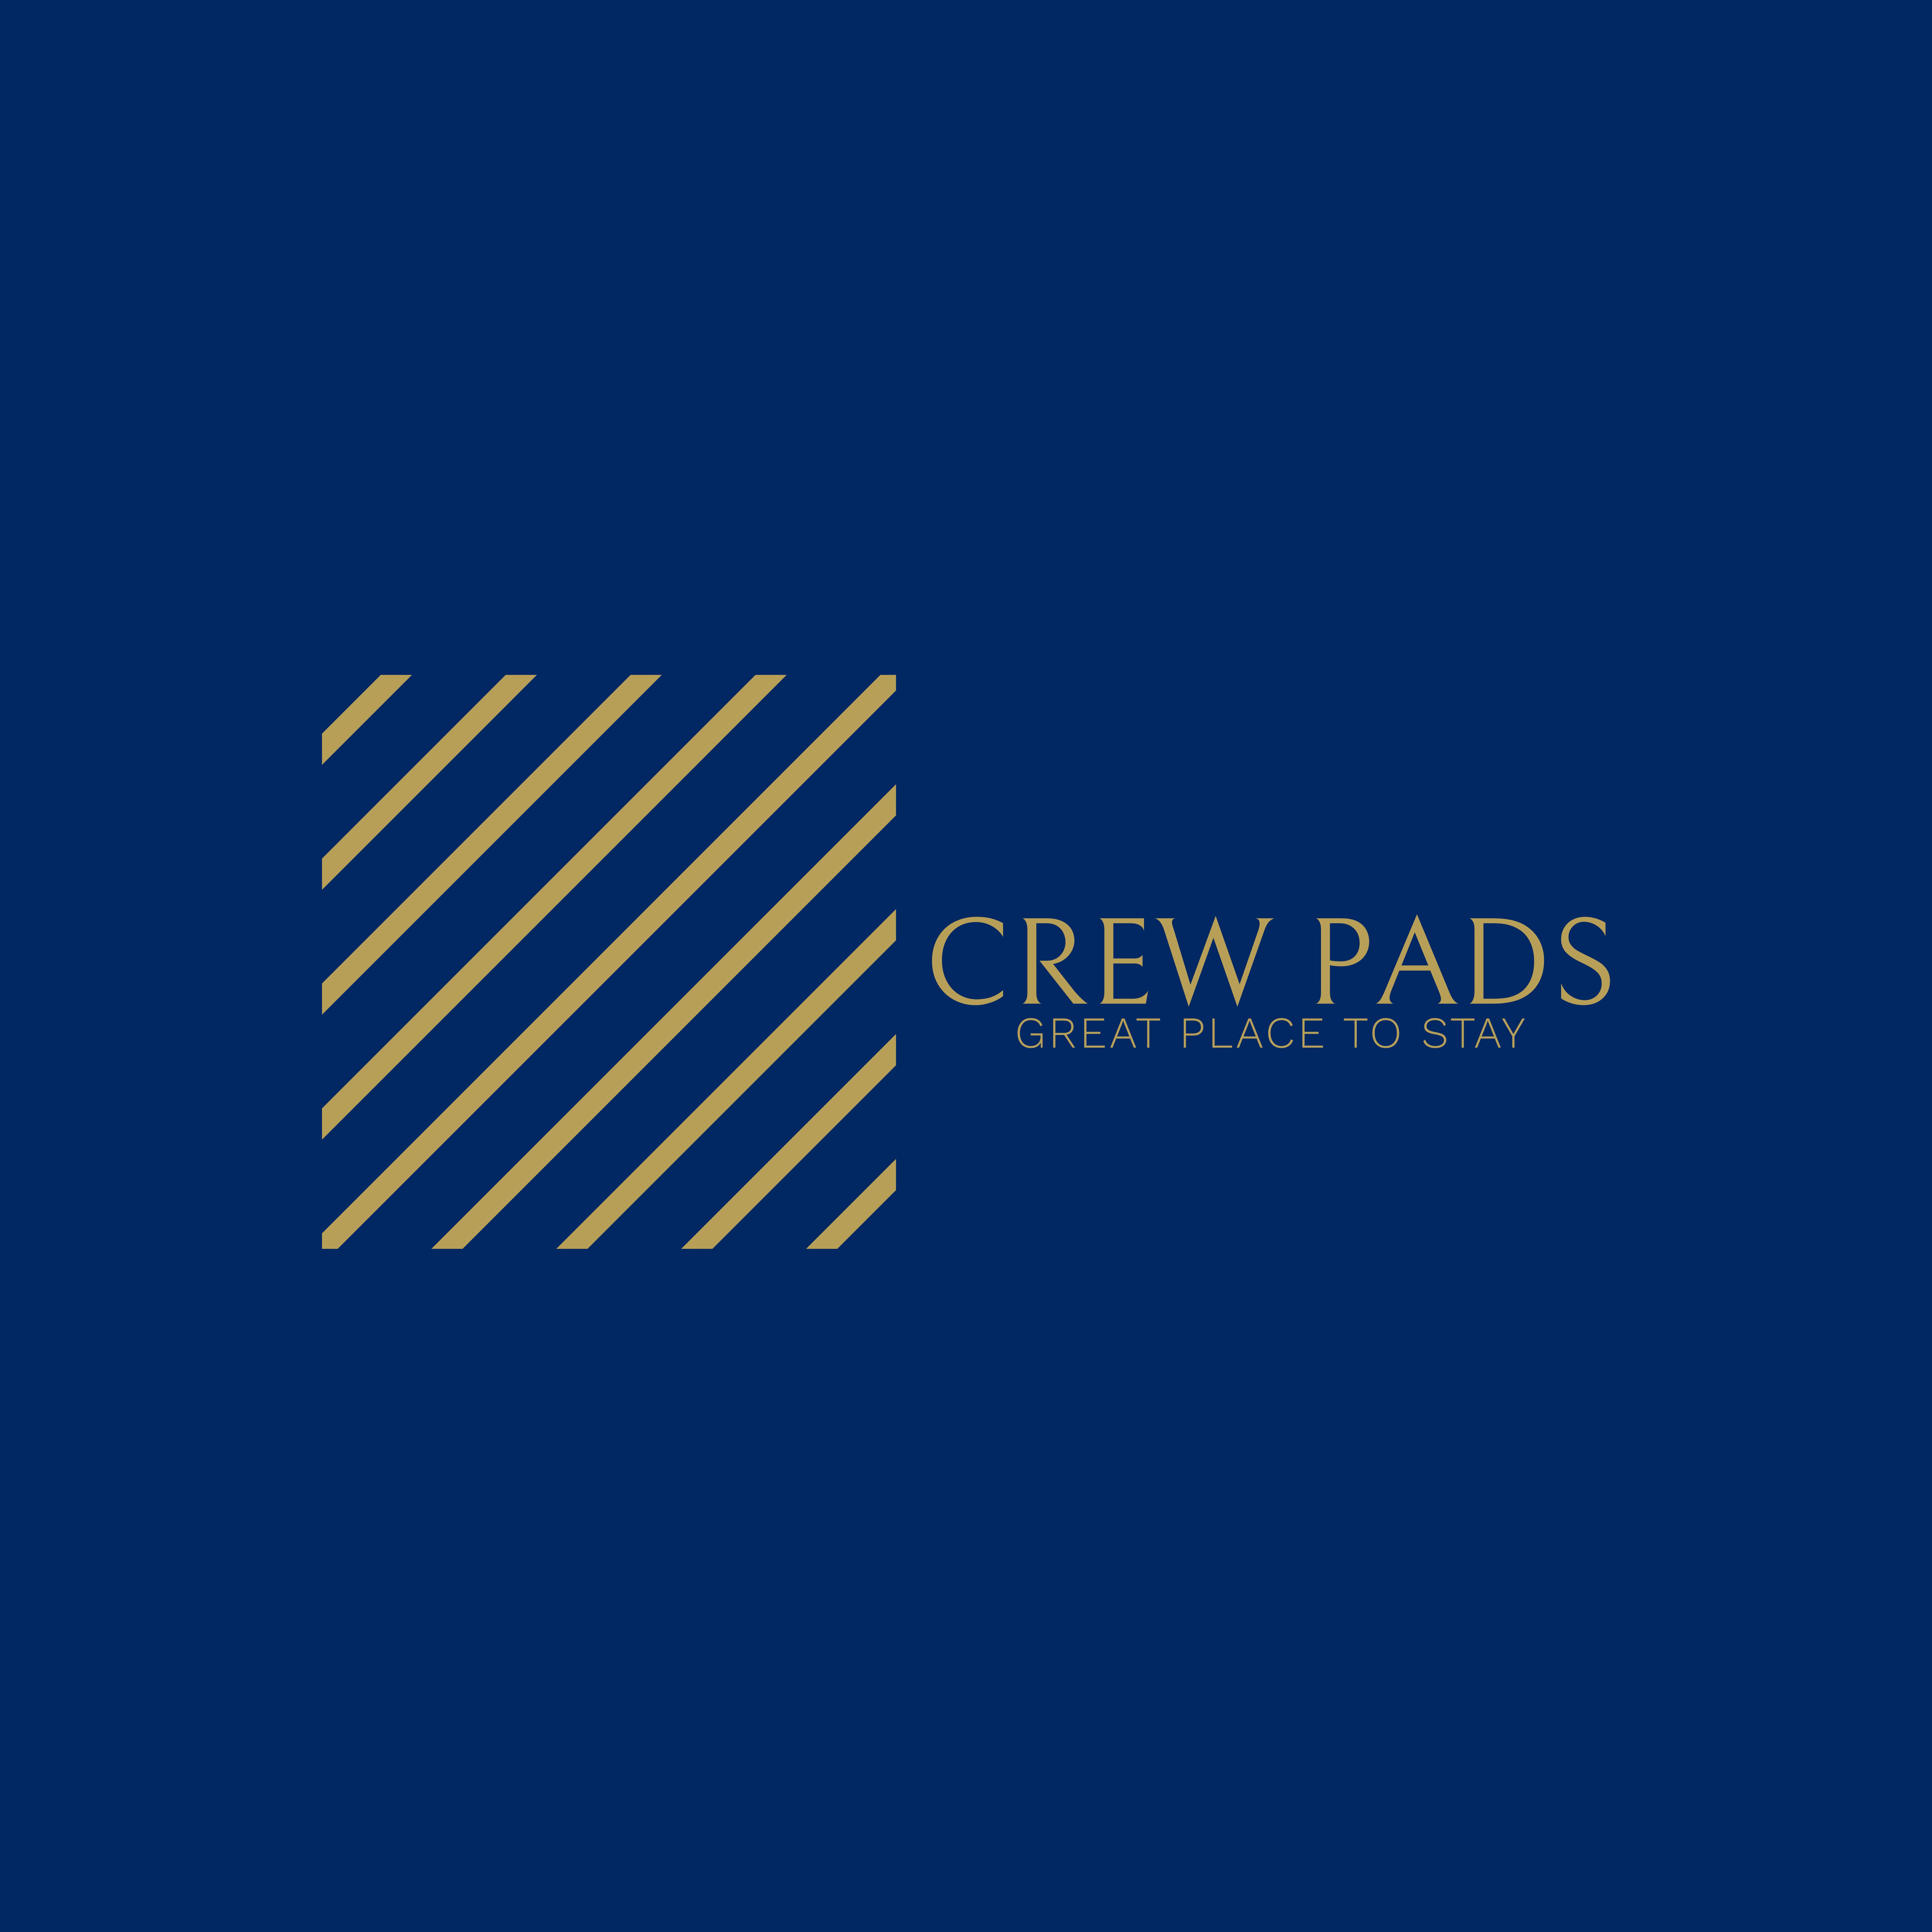 CREW PADS LOGO 1